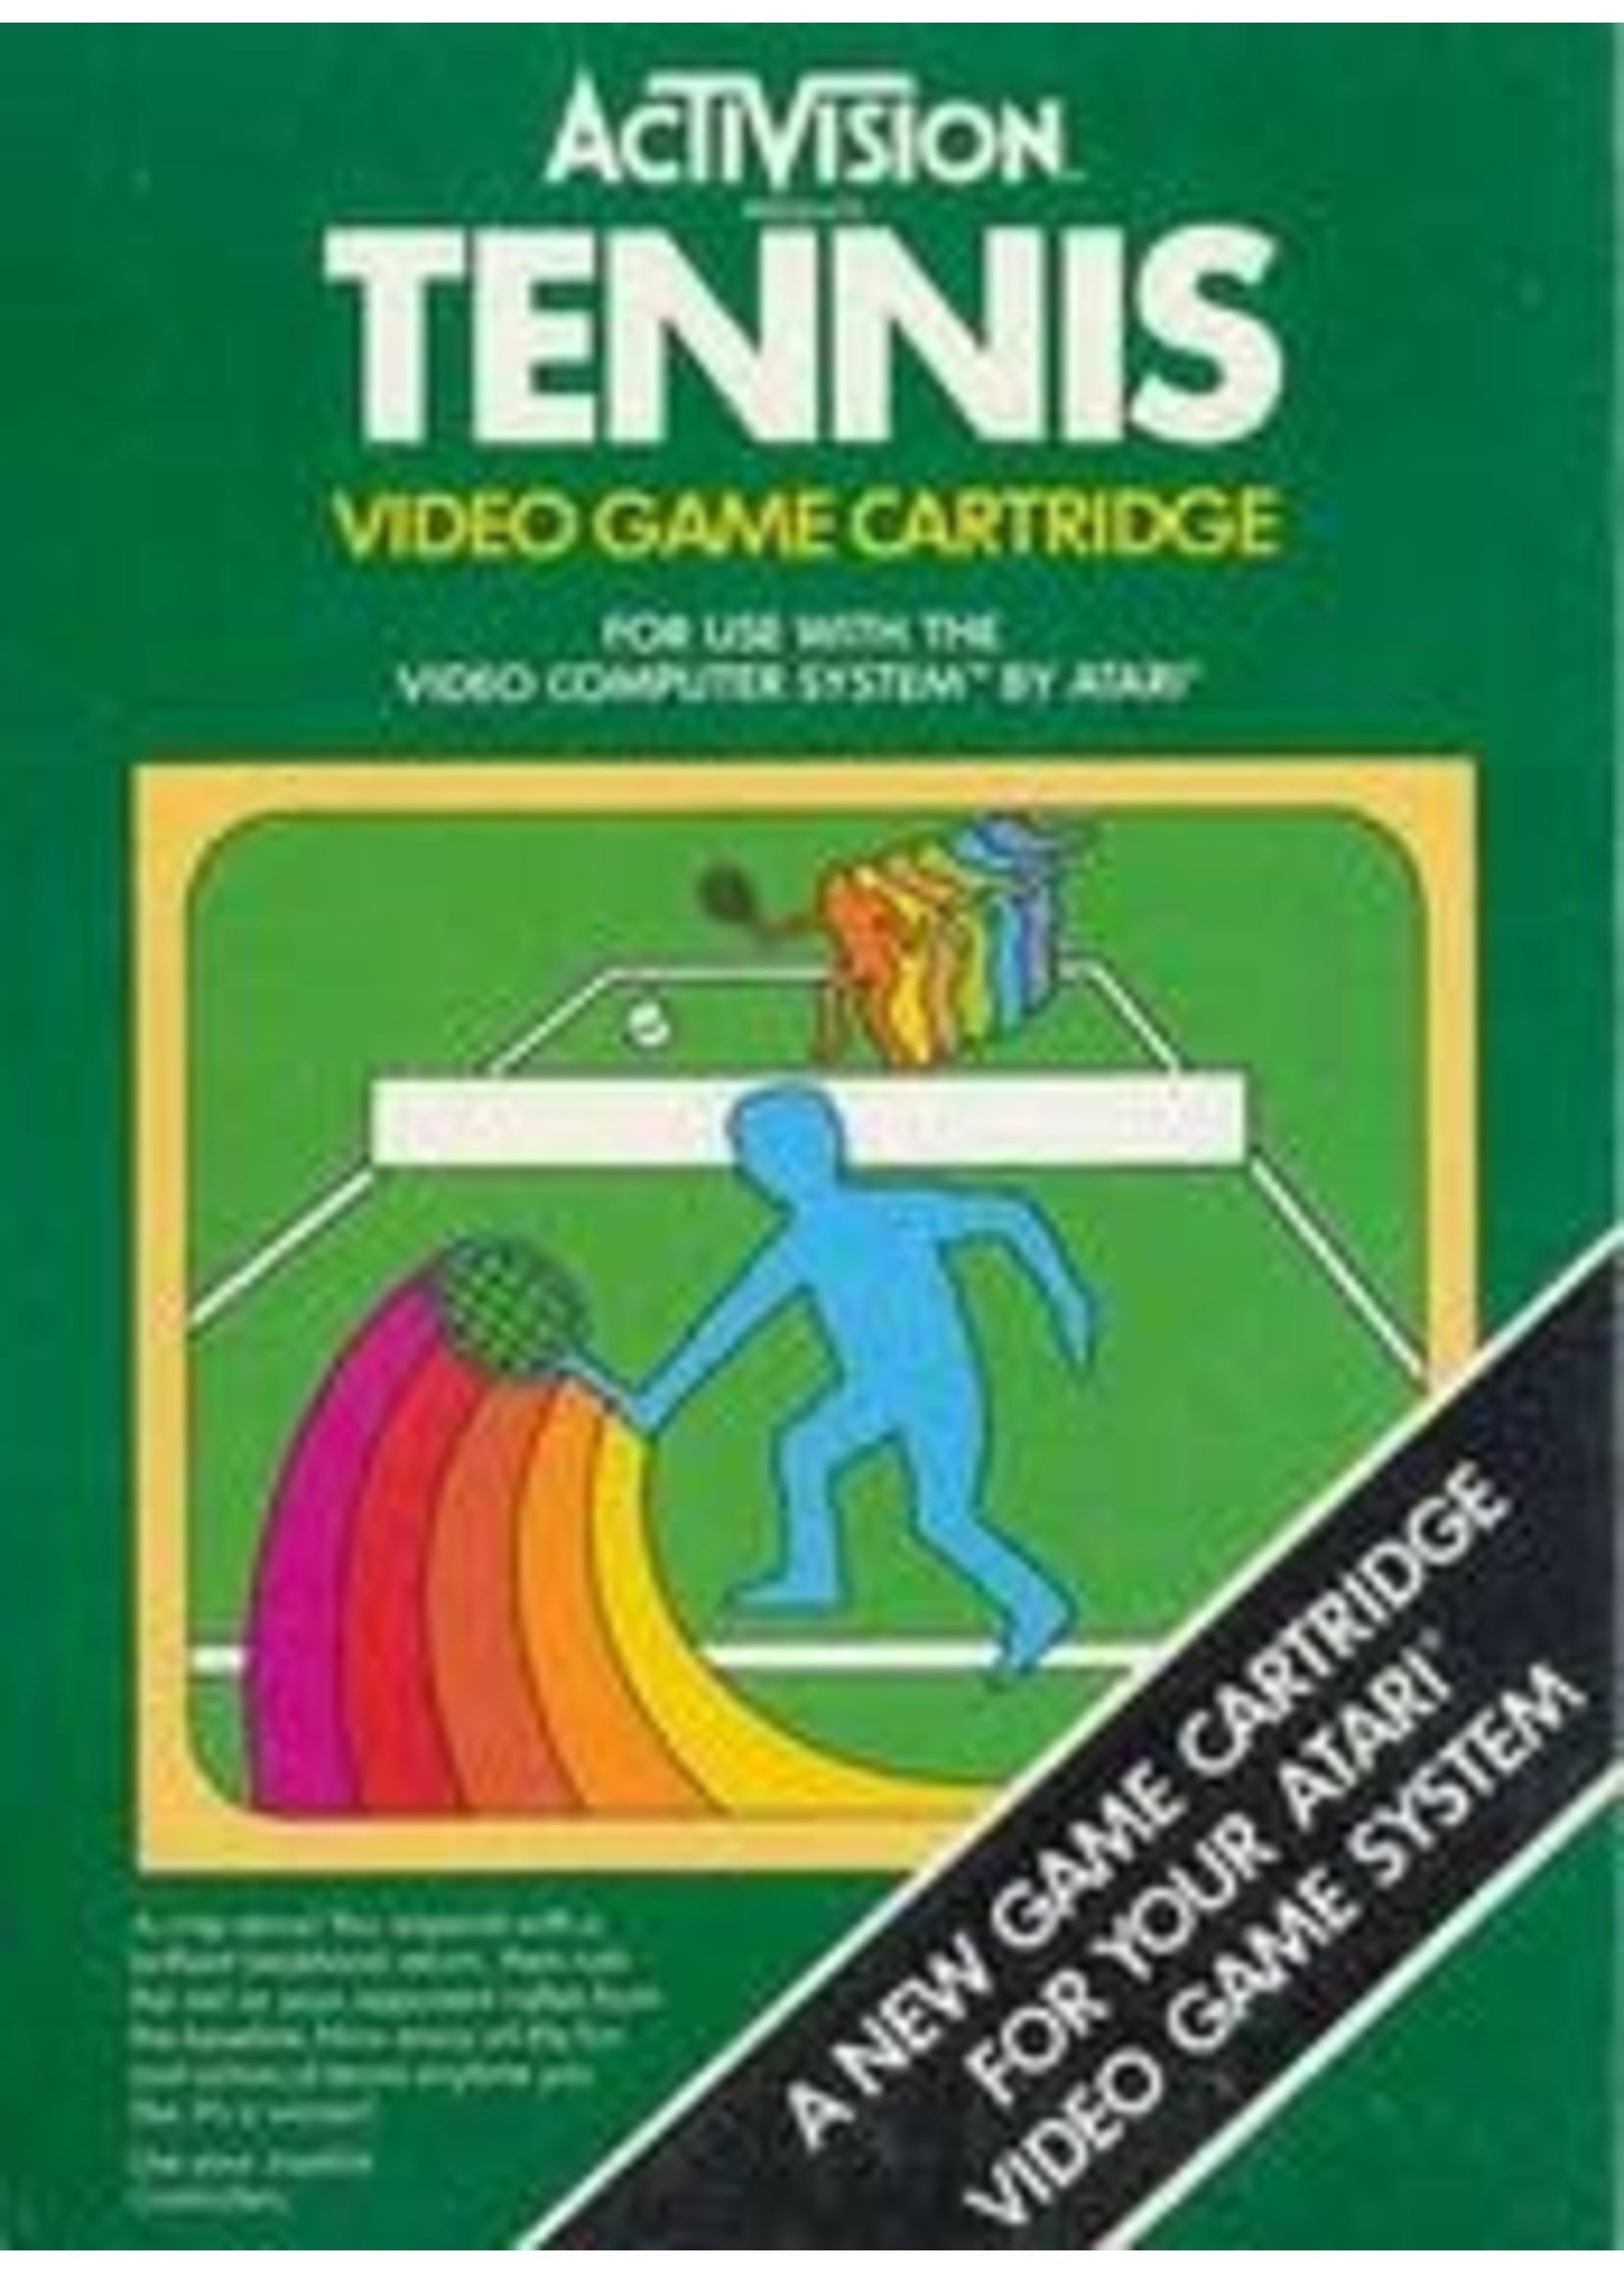 Tennis Atari 2600